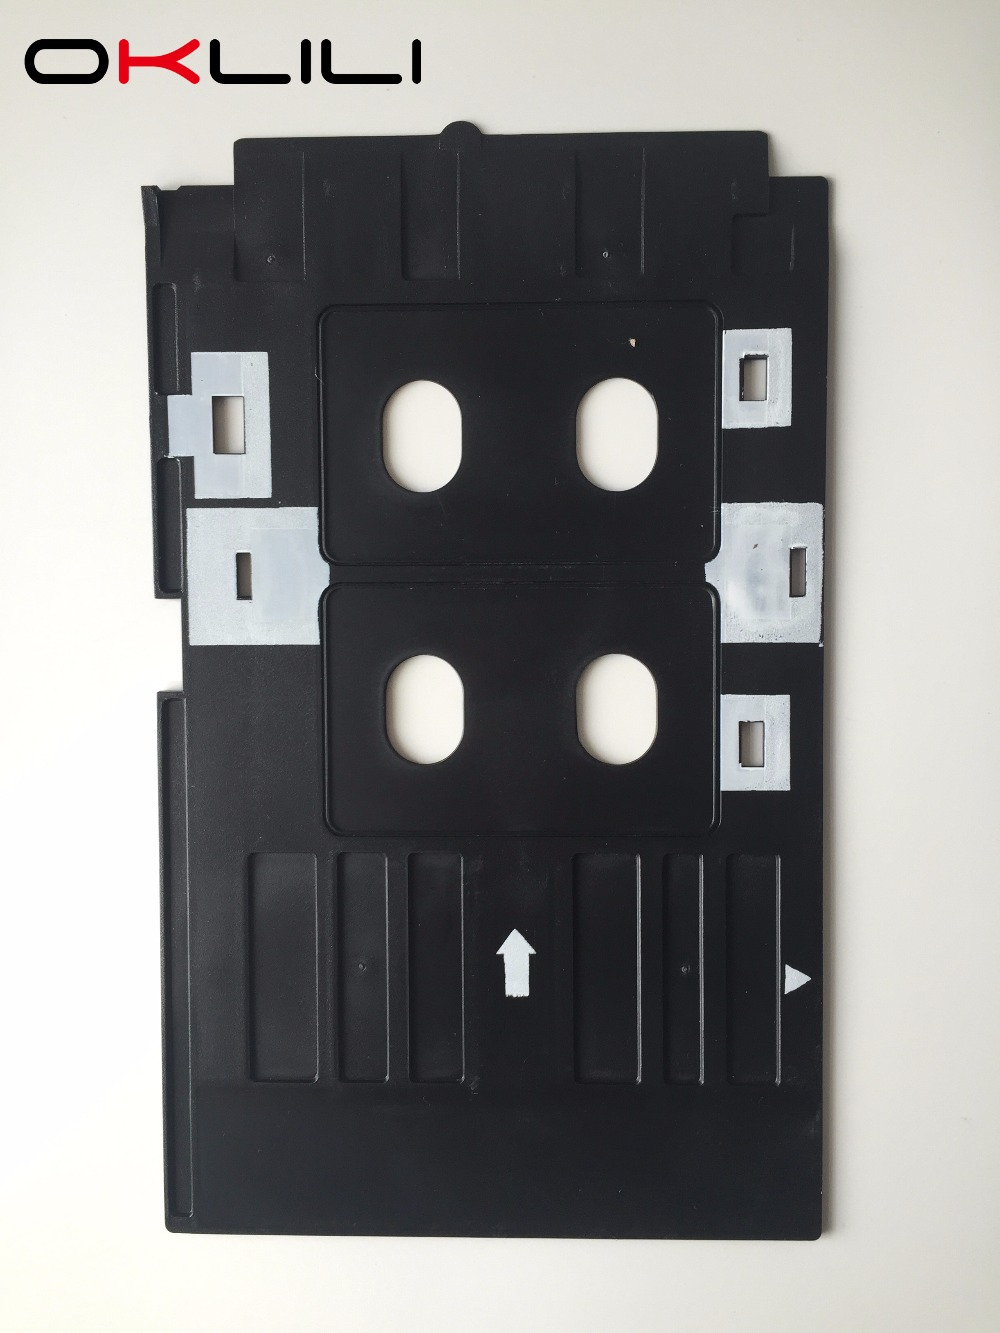 PVC ID-kortskuff Plastkort Skuff for Epson R260 R265 R270 R280 R290 R380 R390 RX680 T50 T60 A50 P50 L800 L801 R330